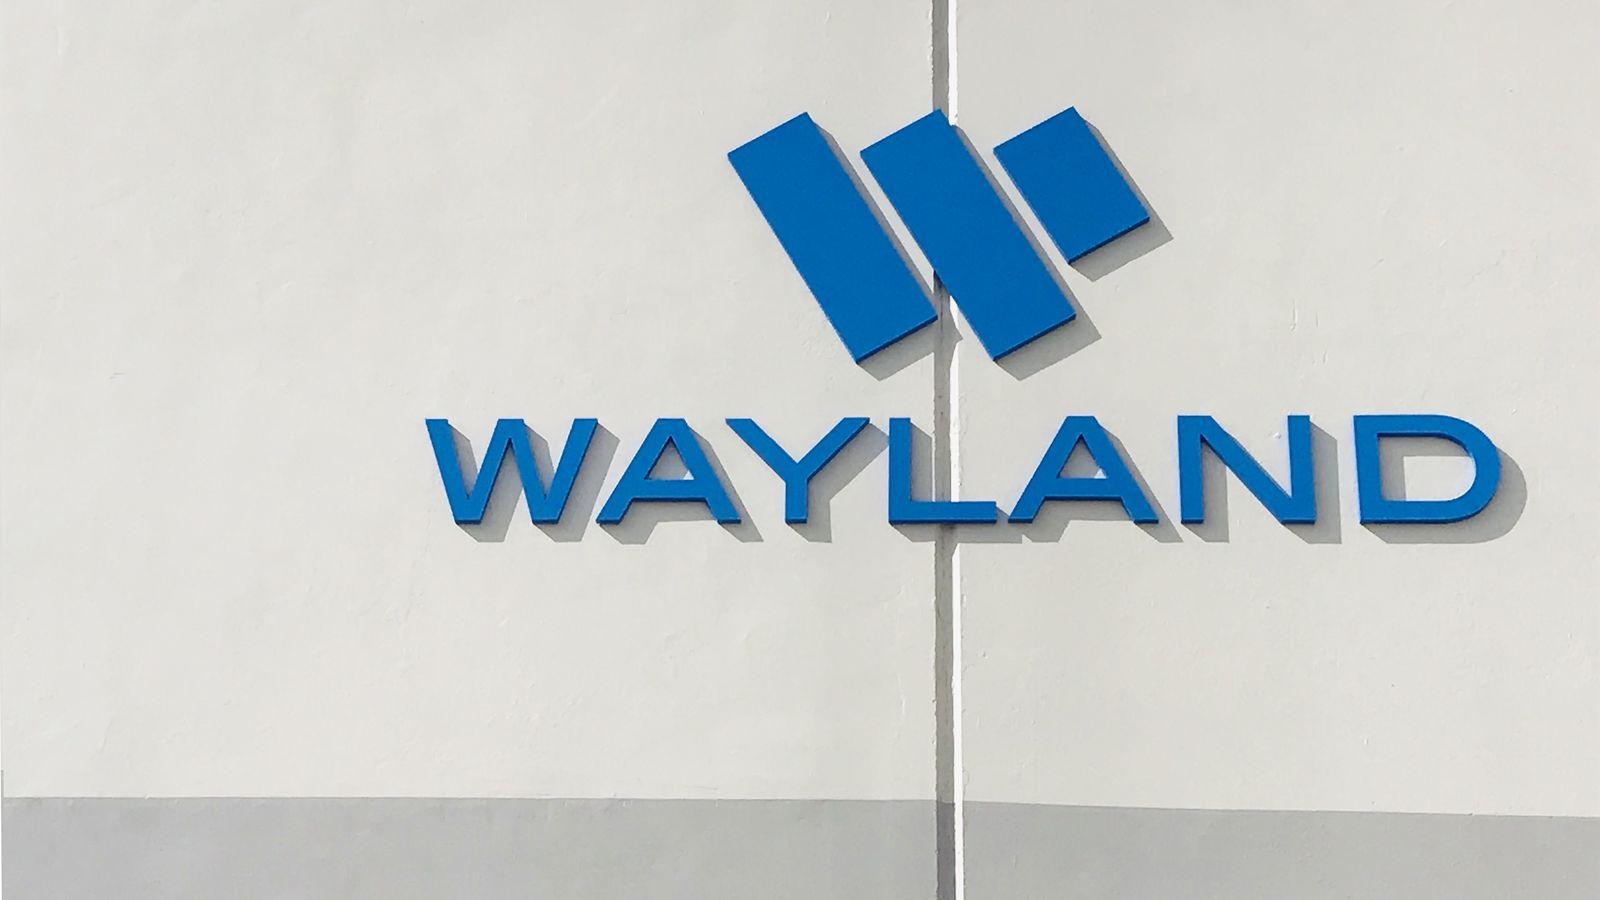 Wayland outdoor sign